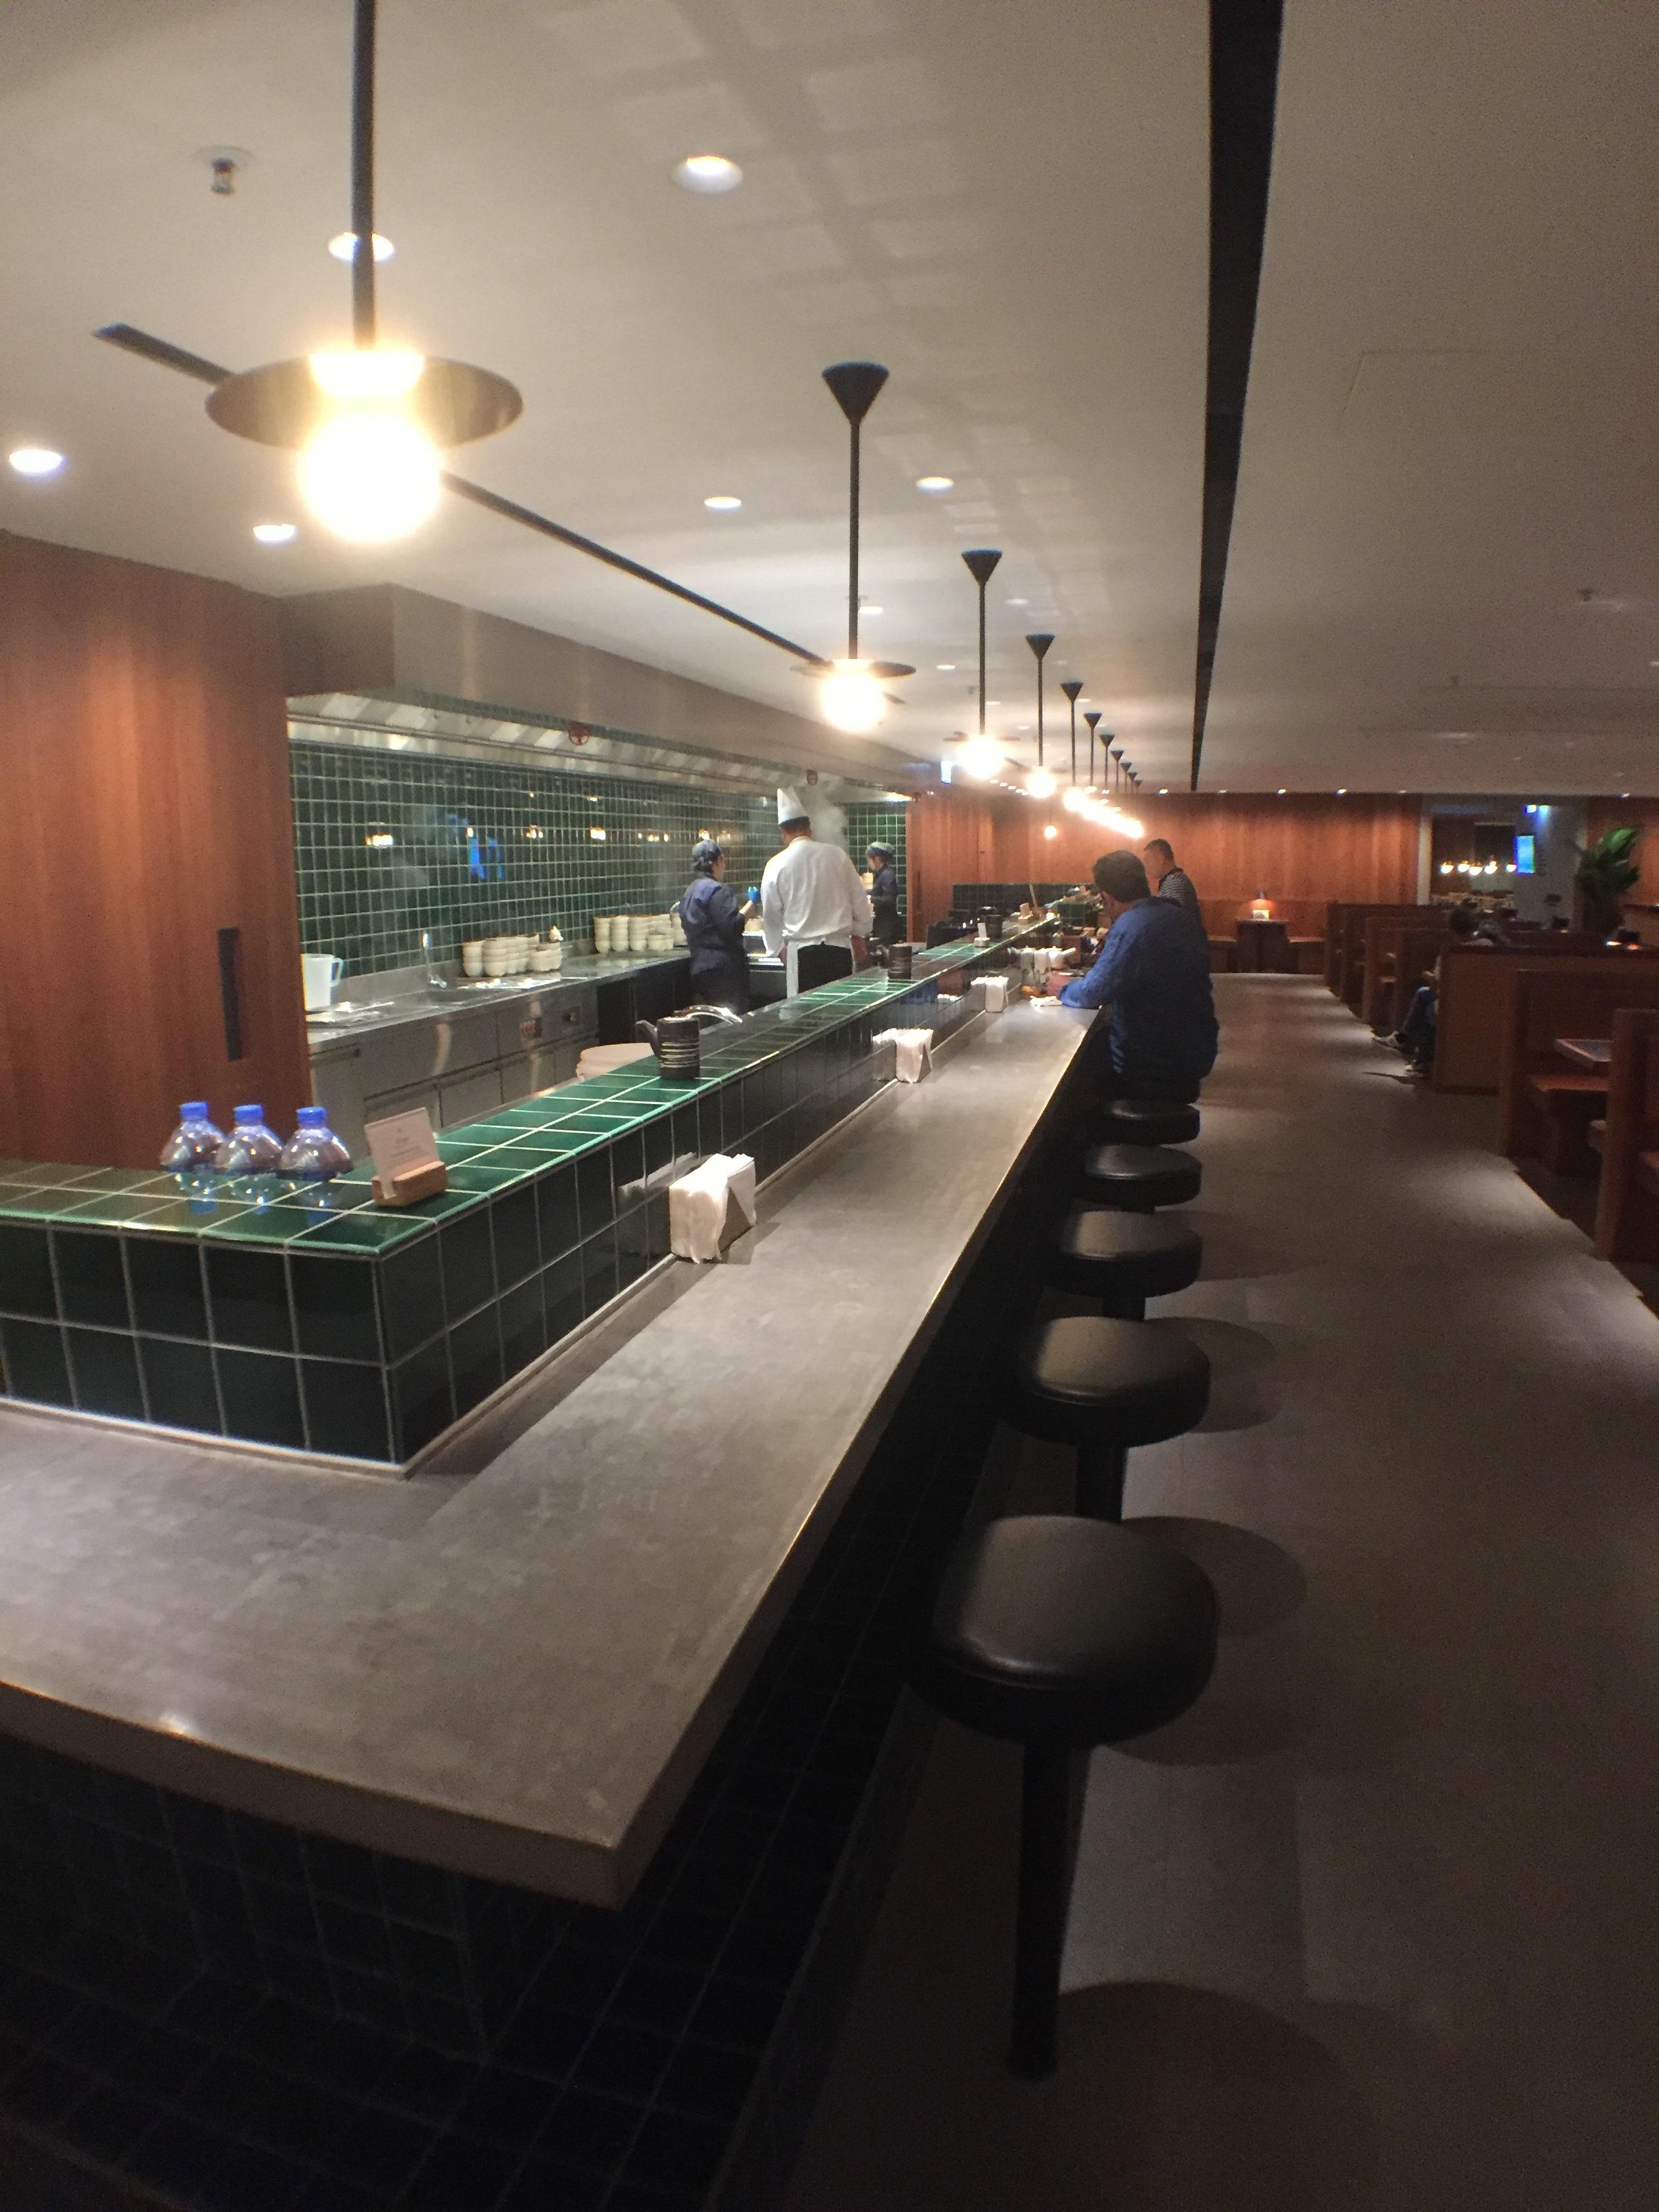 The Noodle Bar. I'll have the steamed pork bun, please.